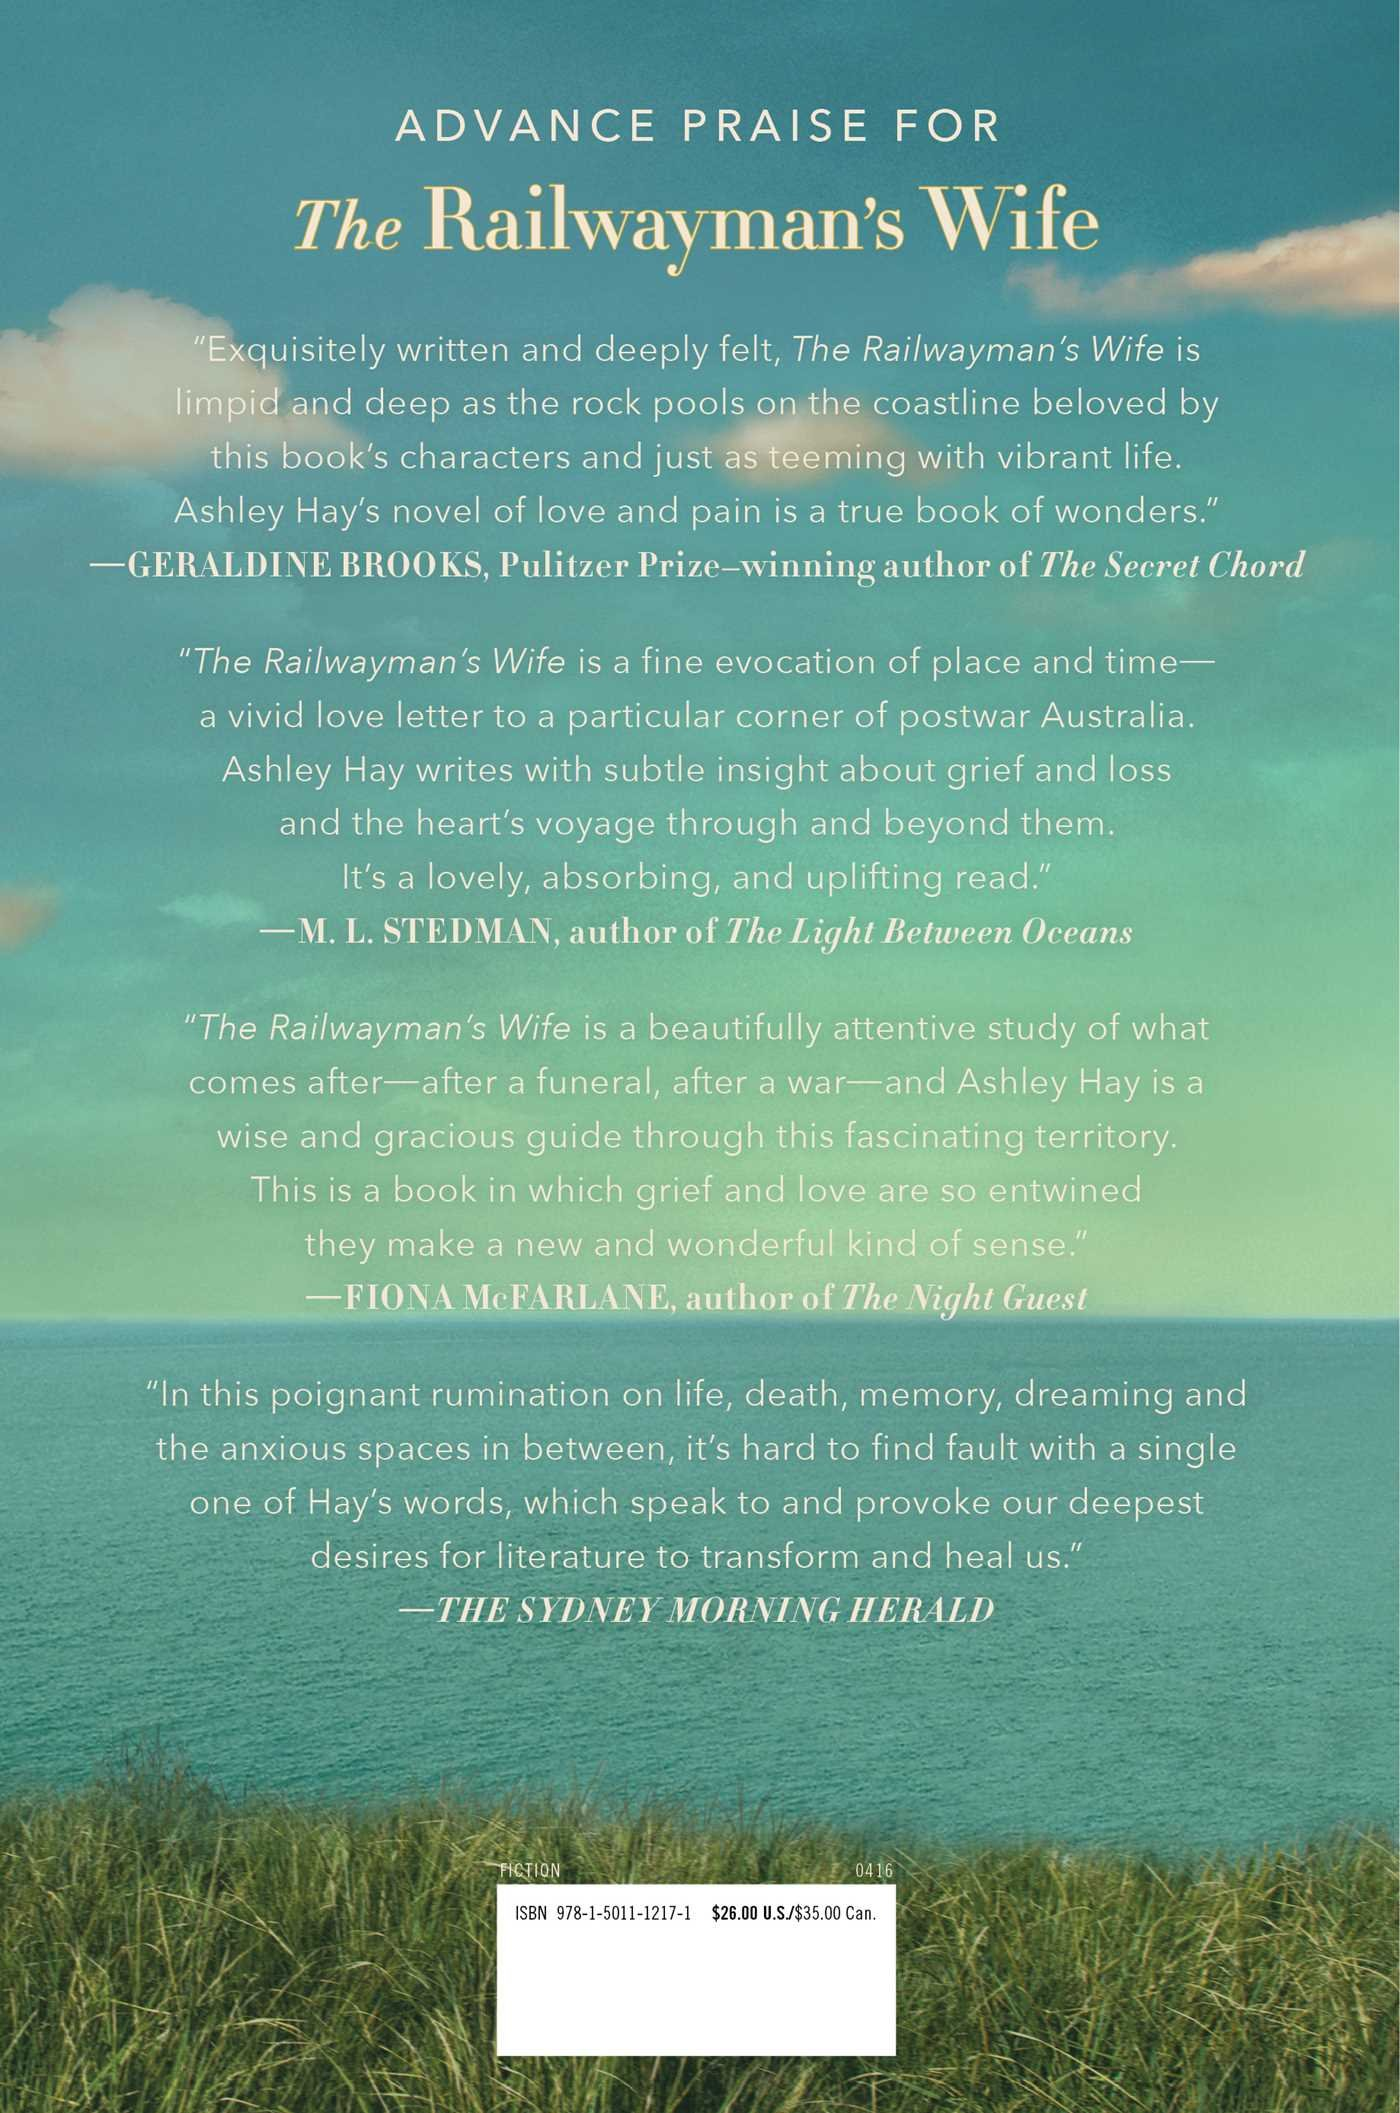 Amazon: The Railwayman's Wife: A Novel (9781501112171): Ashley Hay:  Books